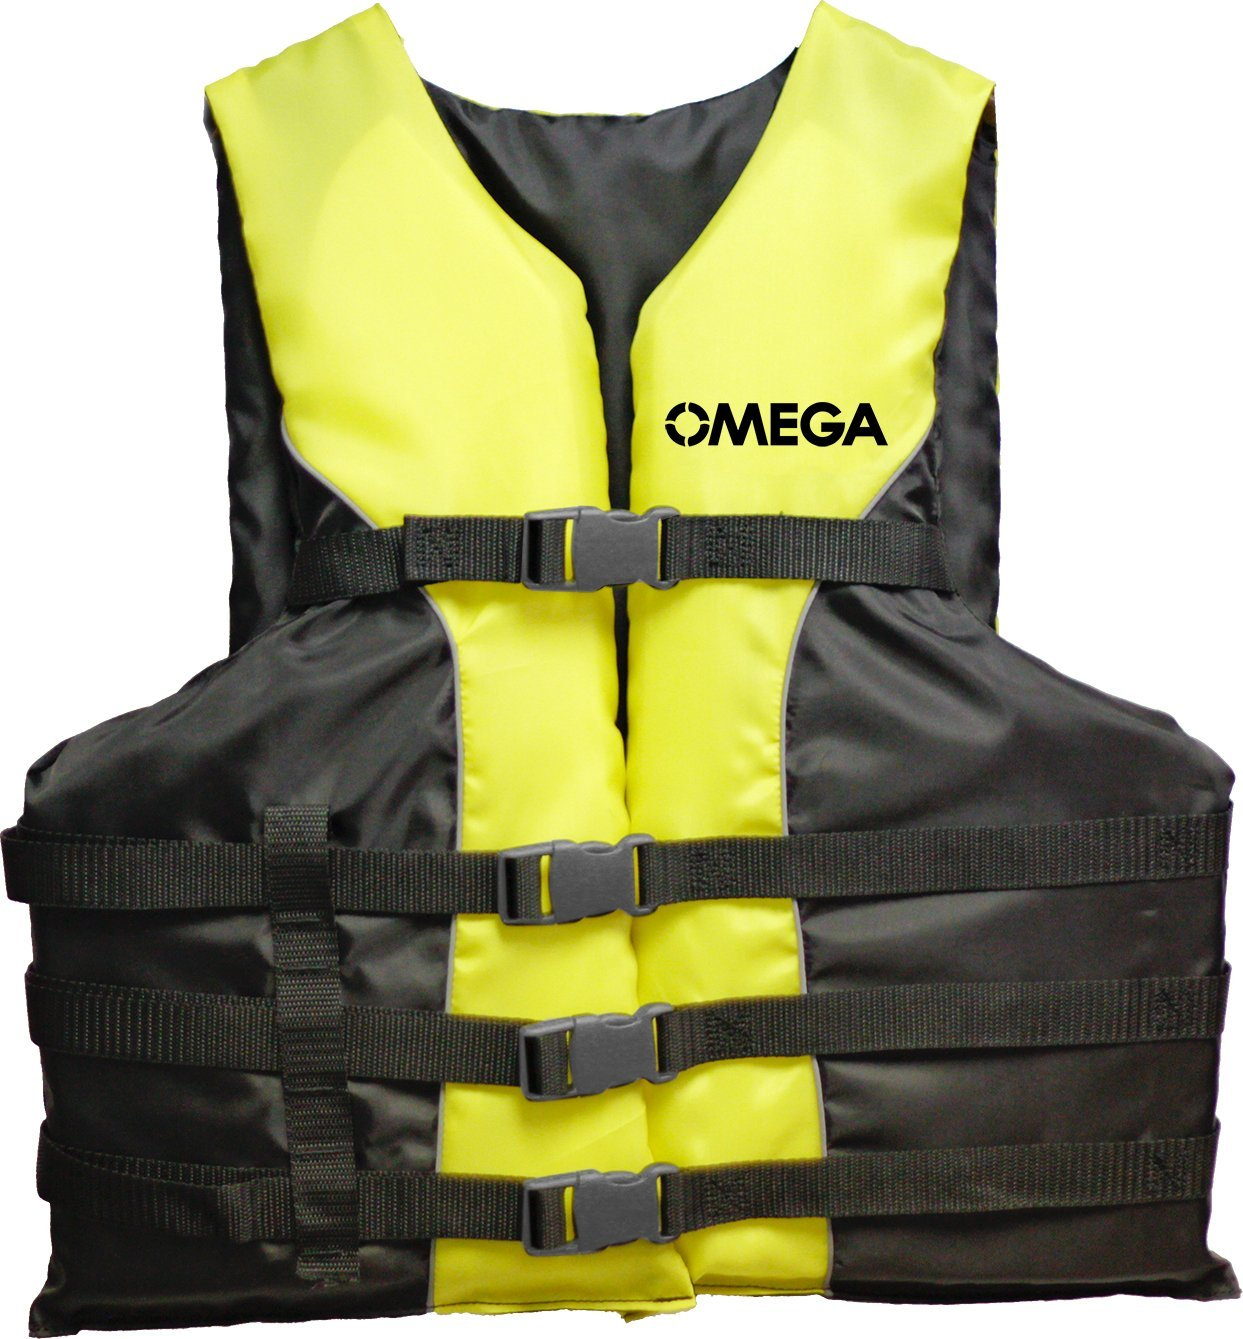 Omega Flowt Multi Sport Life Jacket Vest PFD Type III